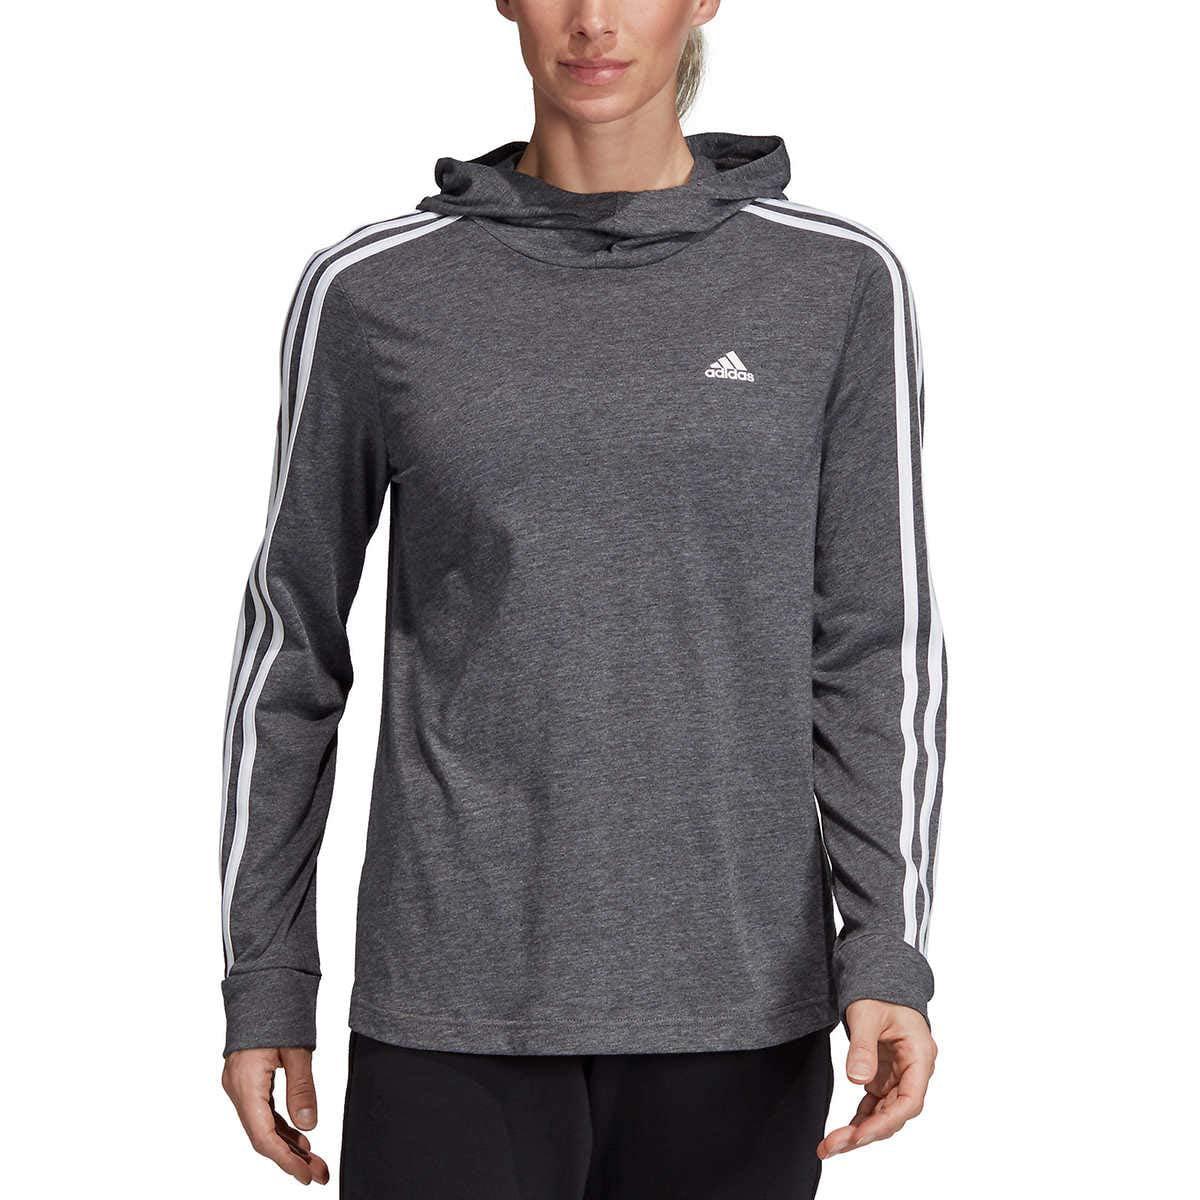 Adidas - adidas Women's Transition Lightweight Jersey Hoodie - S - Black Heather - Walmart.com